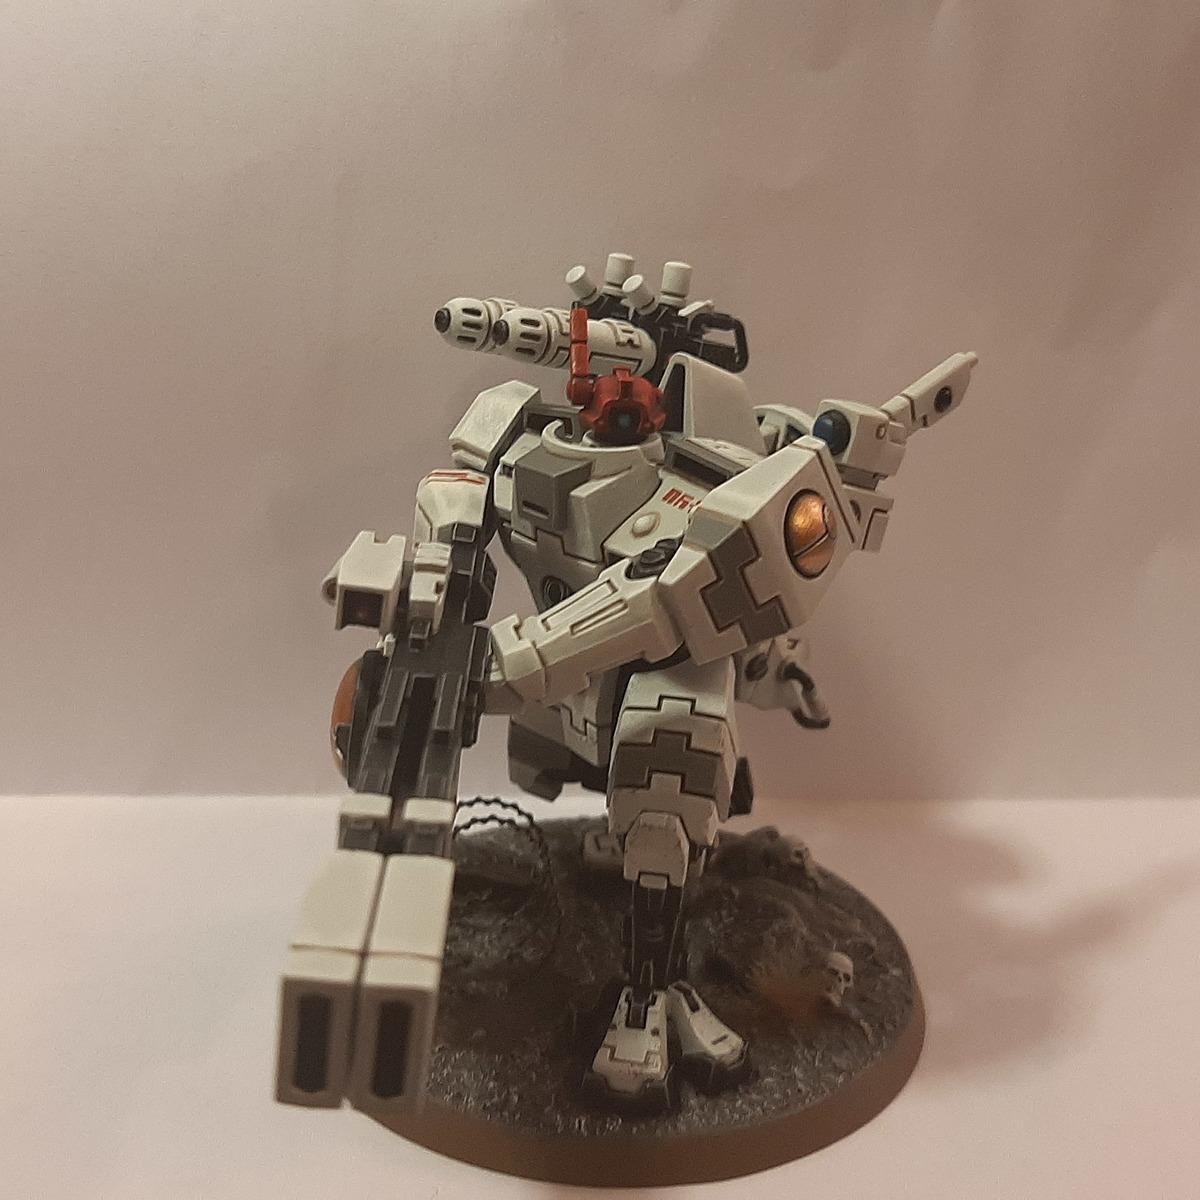 Tau XV-88 Broadside Battlesuit